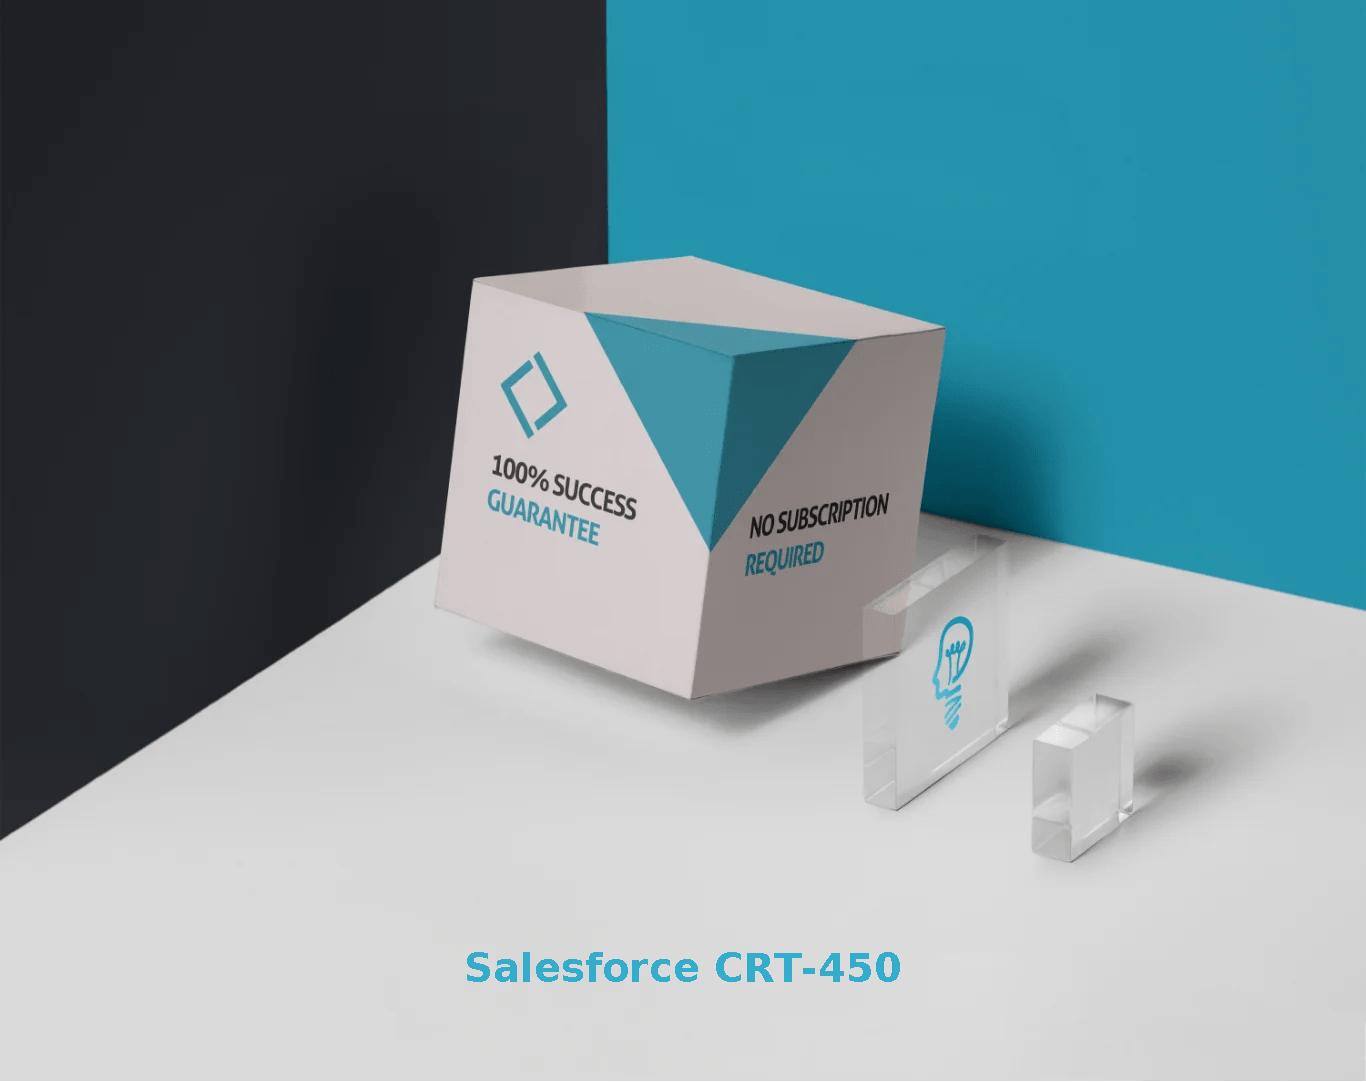 Salesforce CRT-450 Exams